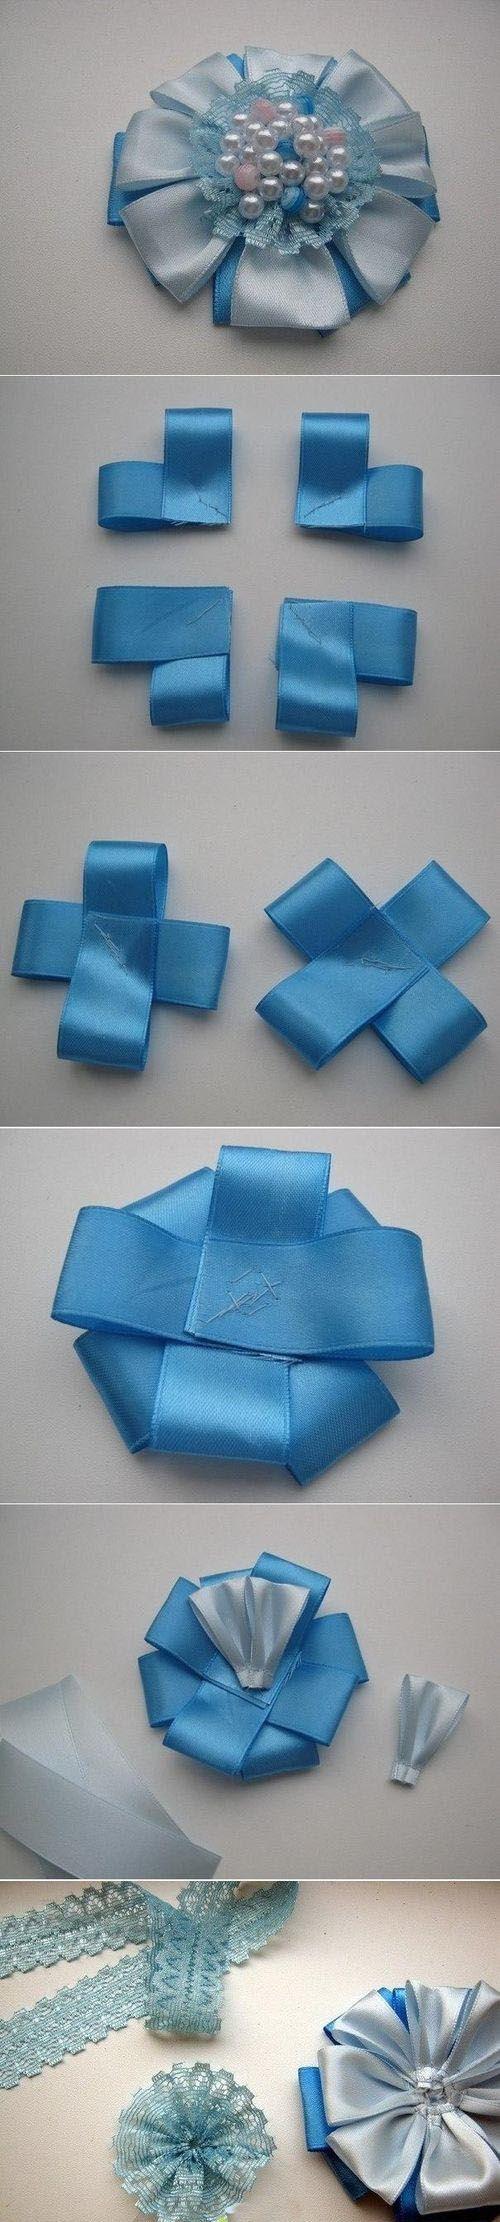 Diy Beautiful Blue Flower   DIY & Crafts Tutorials